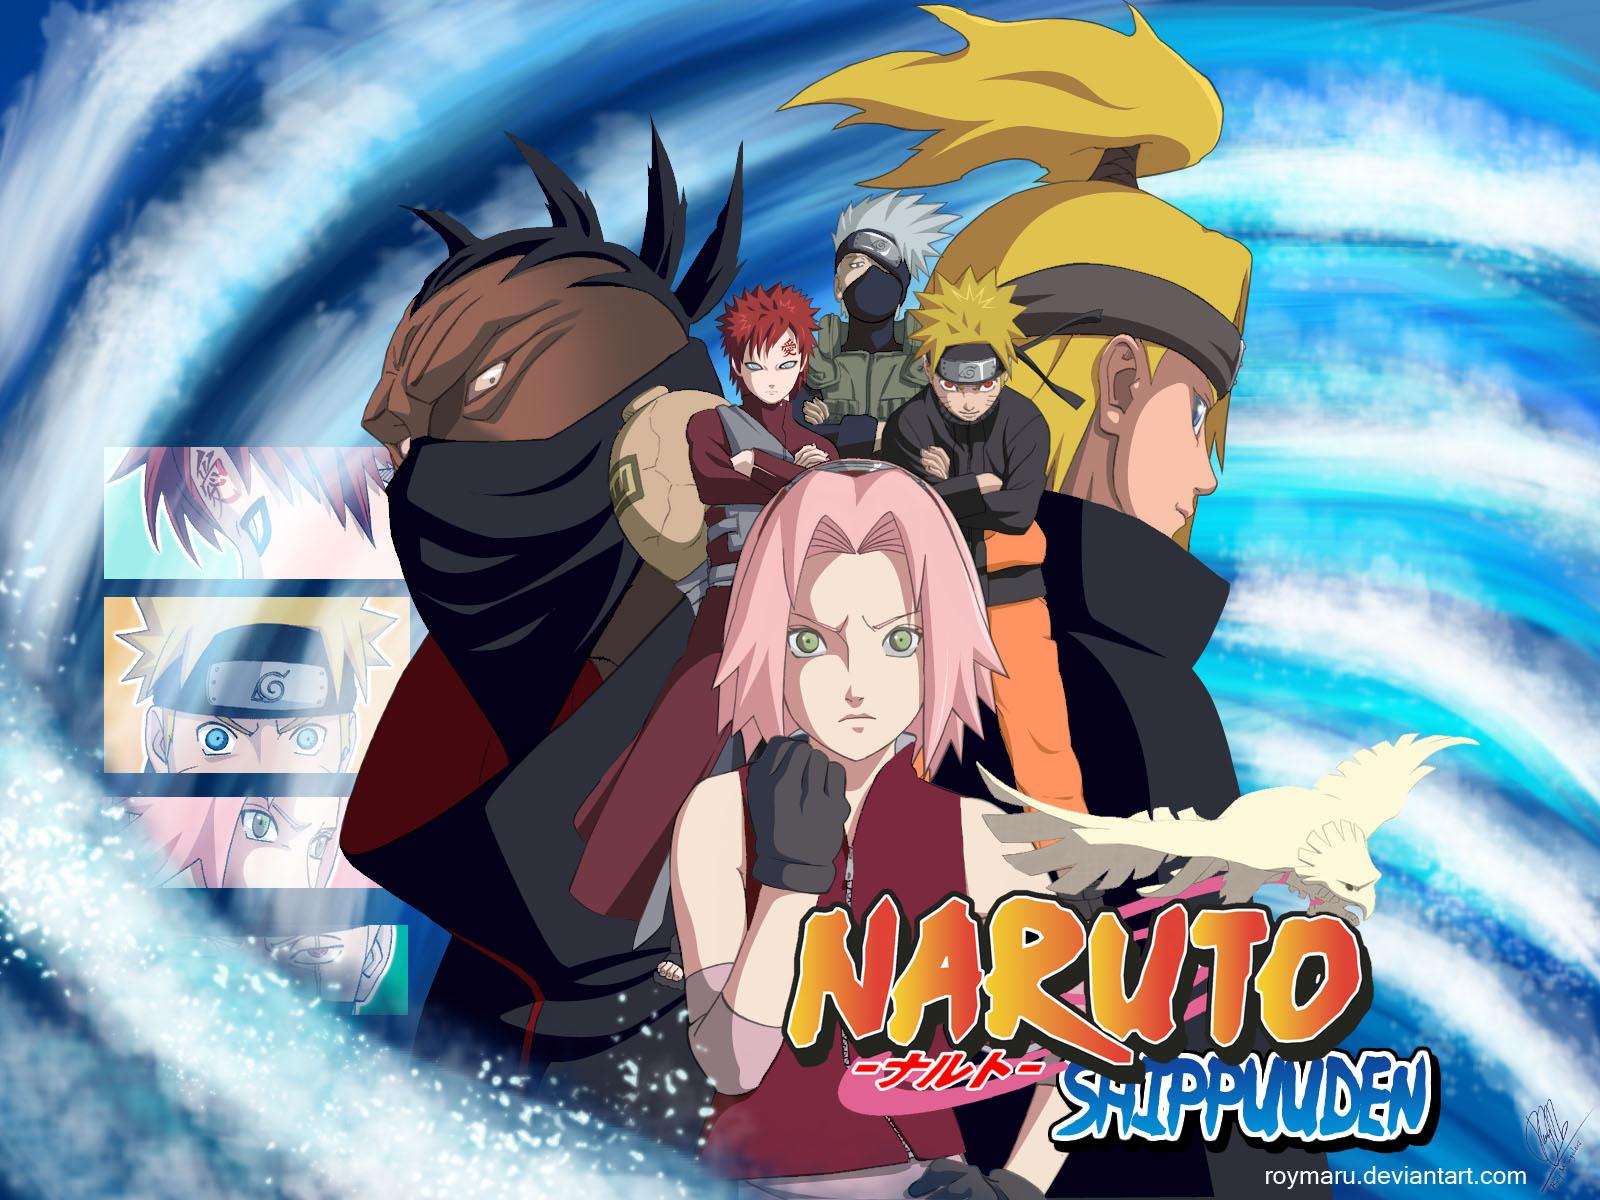 Great Wallpaper Macbook Naruto - naruto_shippuuden___wallpaper_by_roymaru  You Should Have_839138.jpg